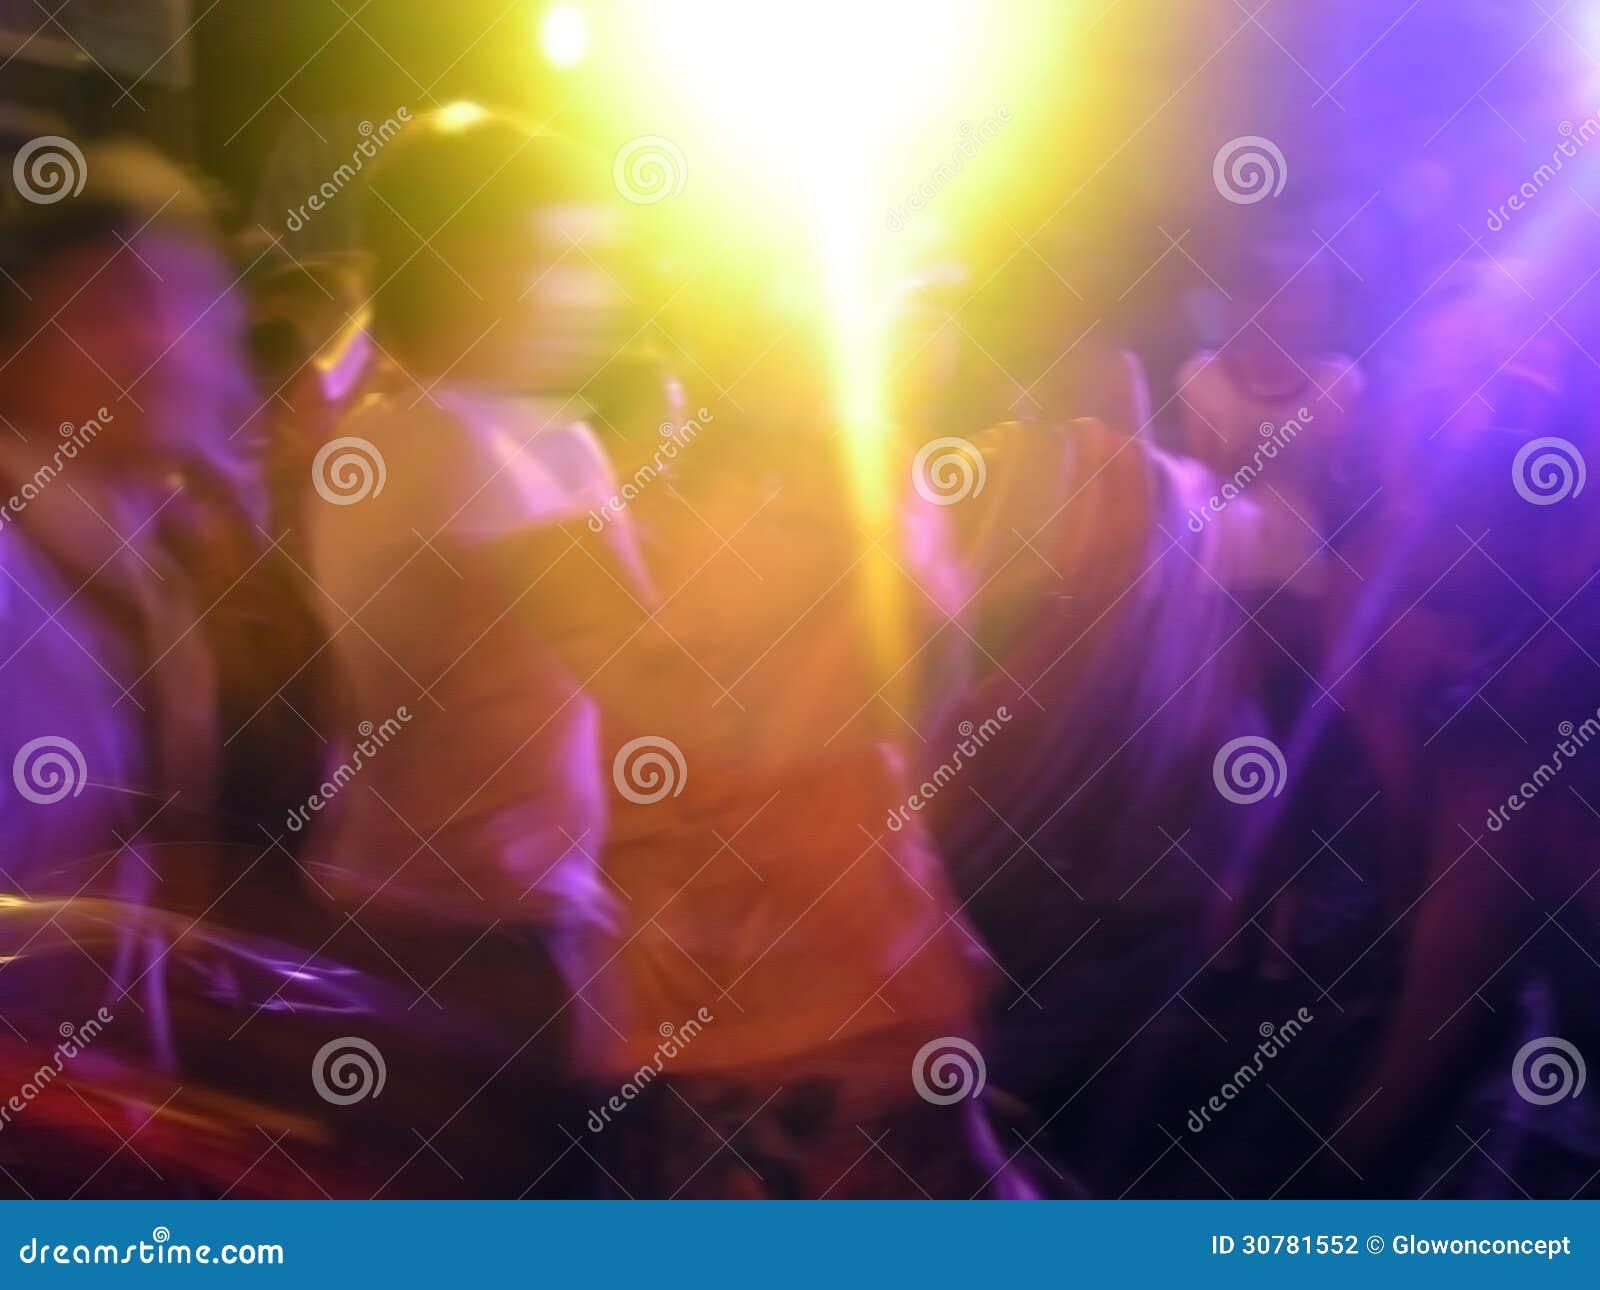 Party light in pub dance, clubbing